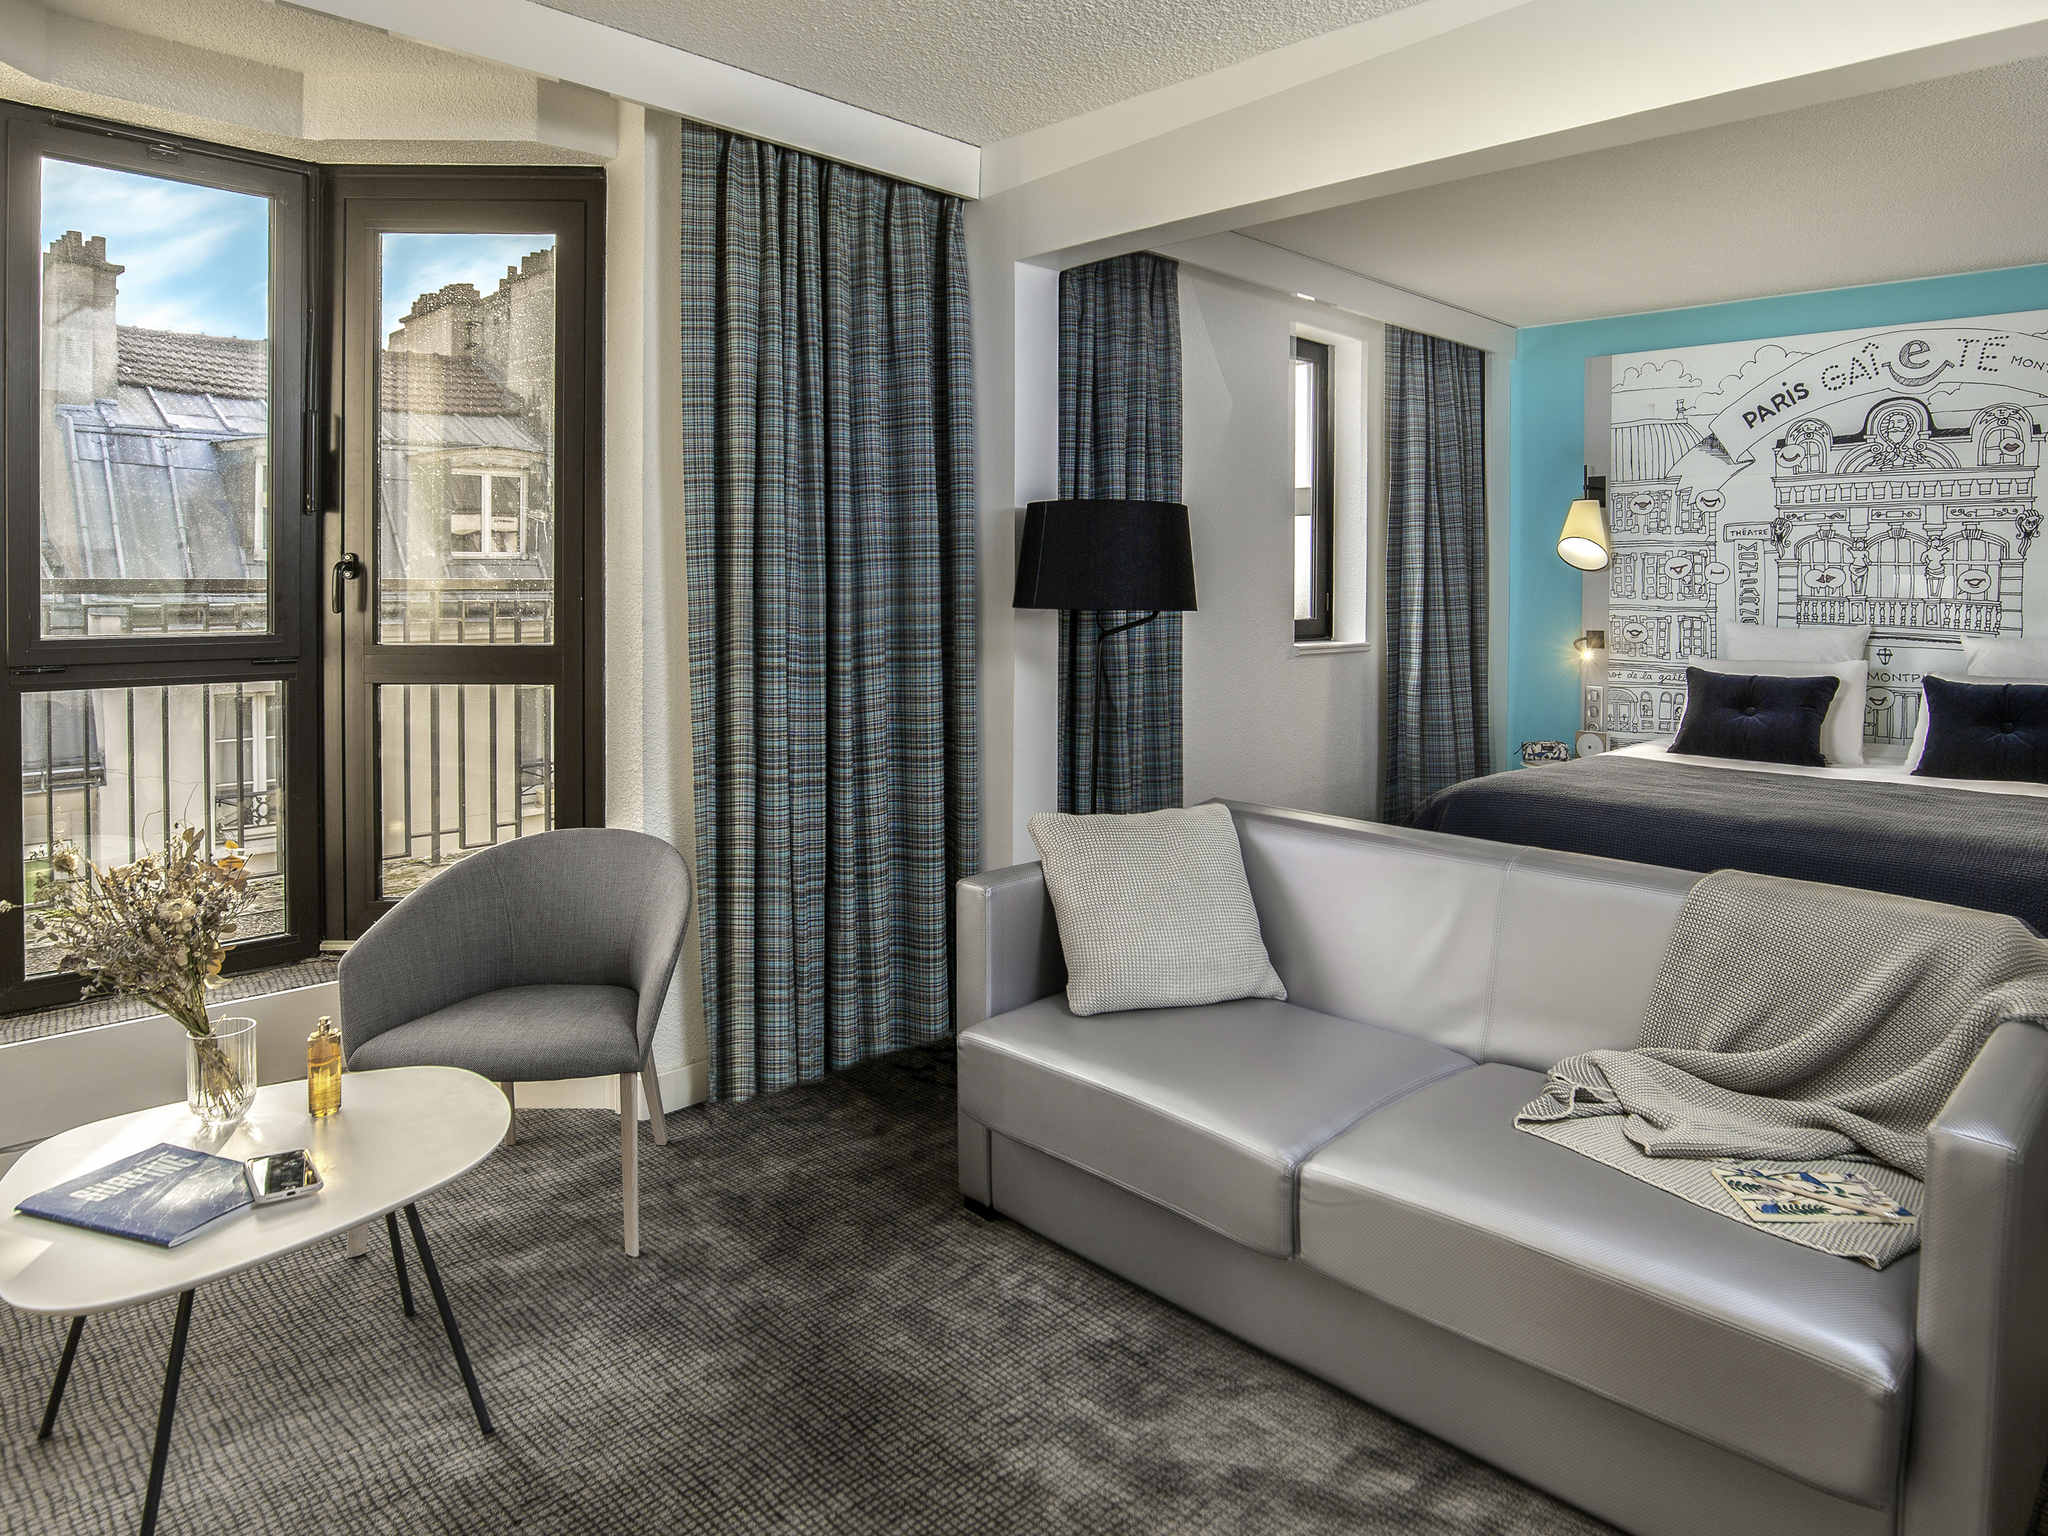 فندق - مركيور Mercure باريس غار مونبارناس